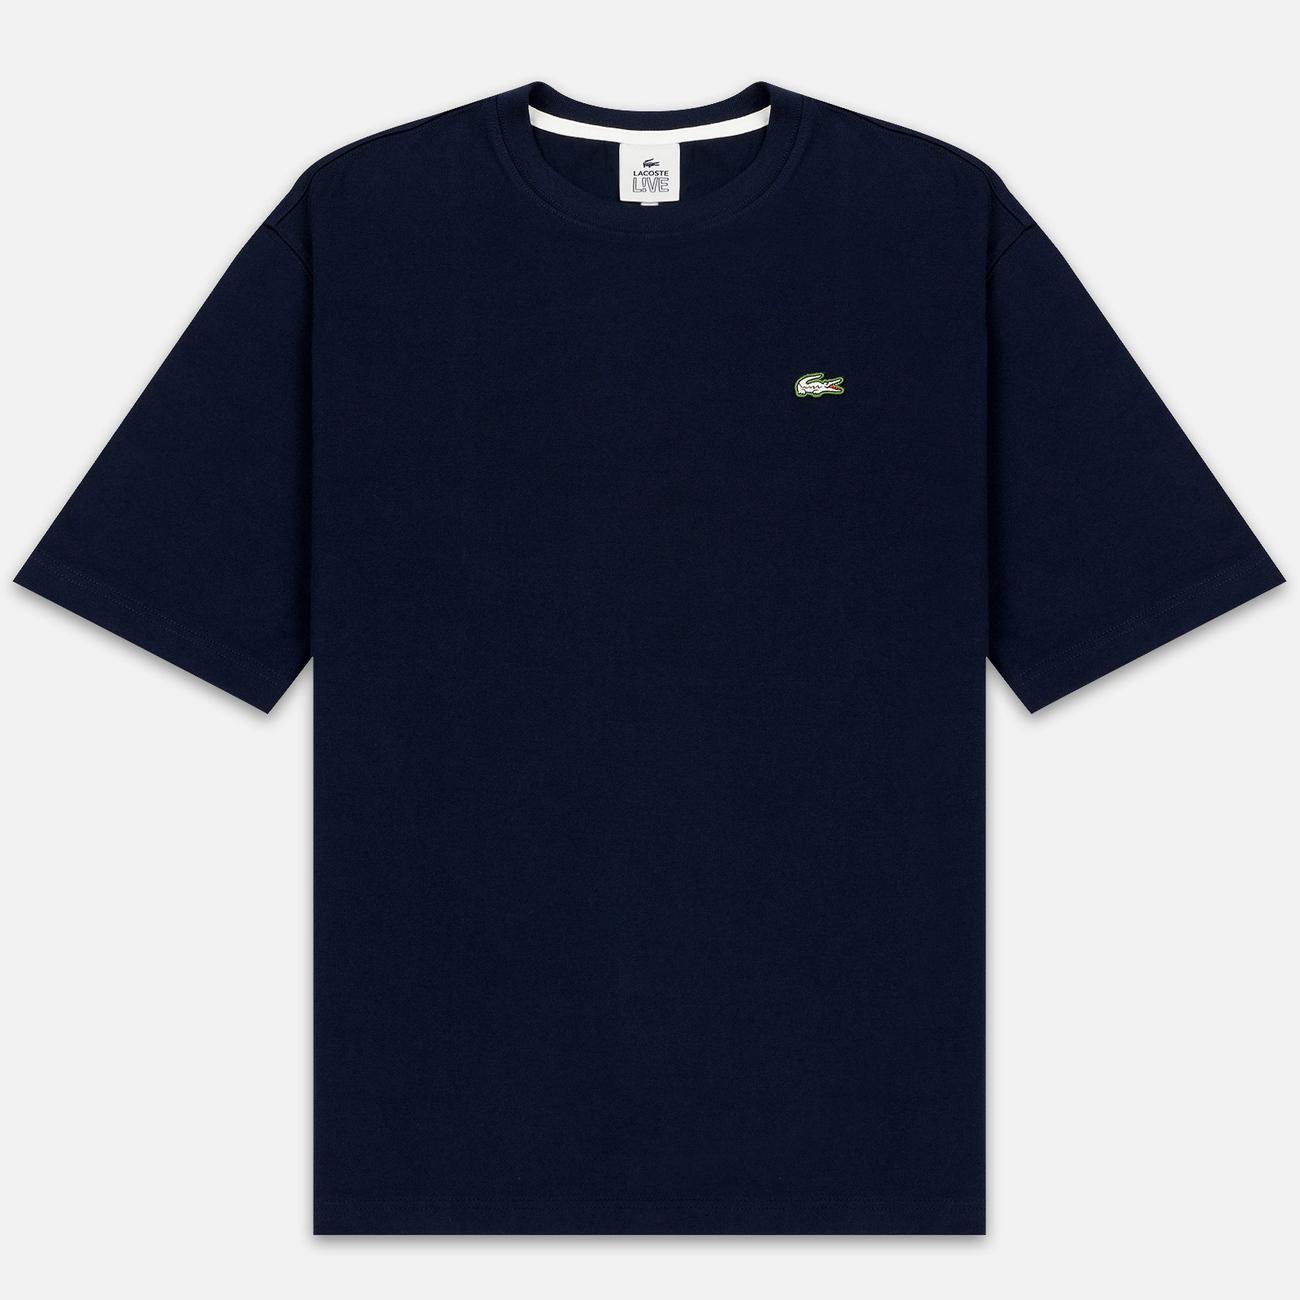 Мужская футболка Lacoste Live Crew Neck Loose Cotton Navy Blue